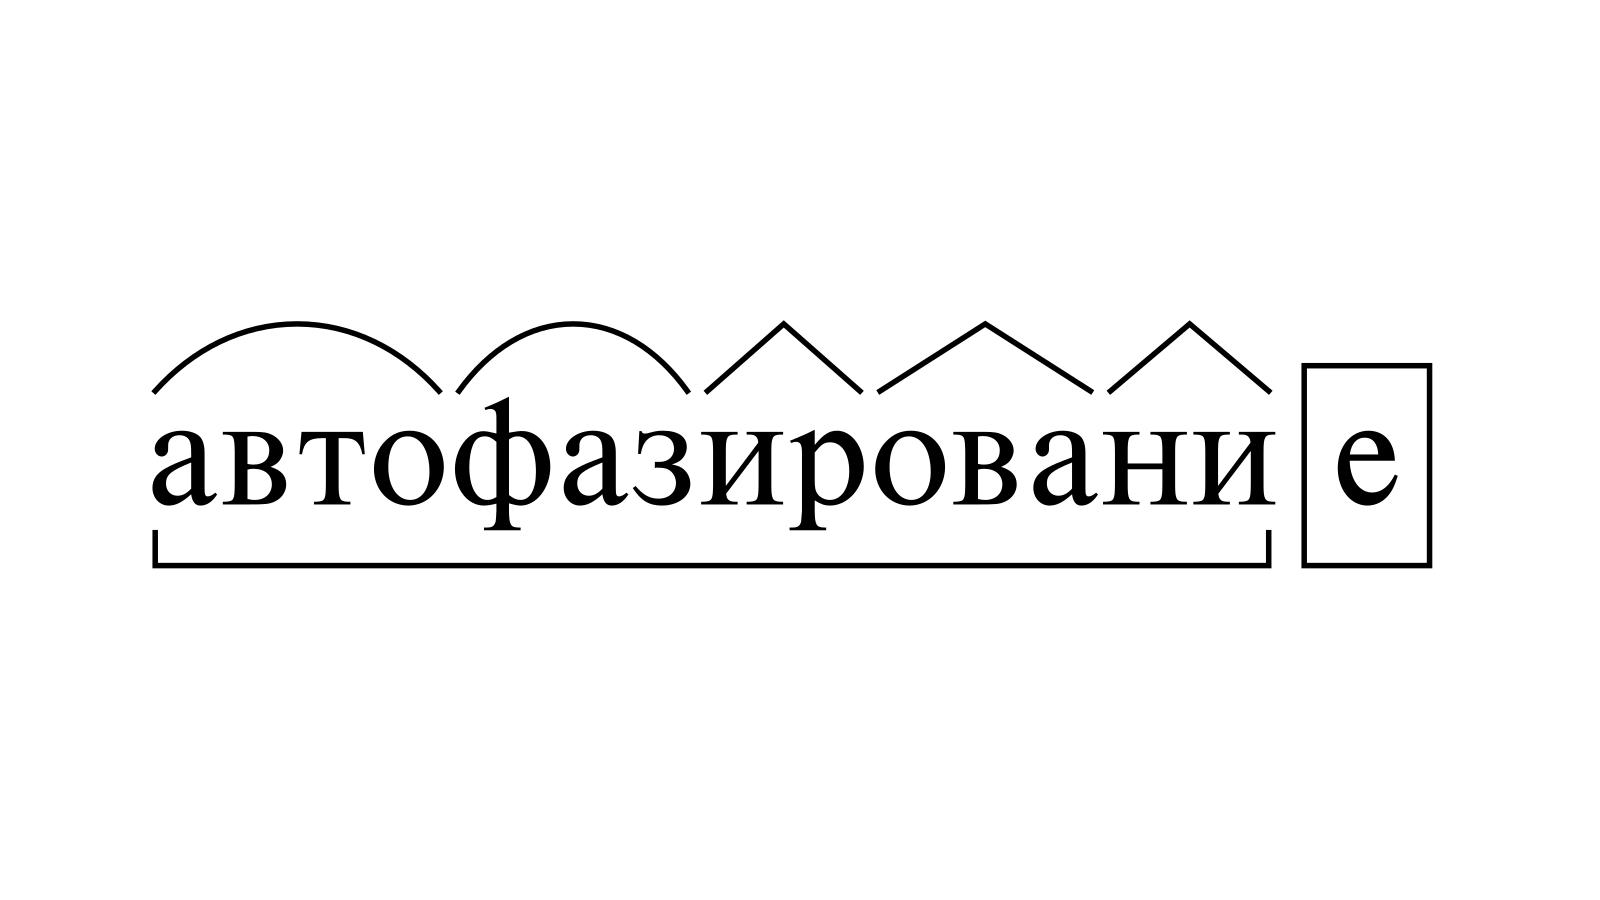 Разбор слова «автофазирование» по составу